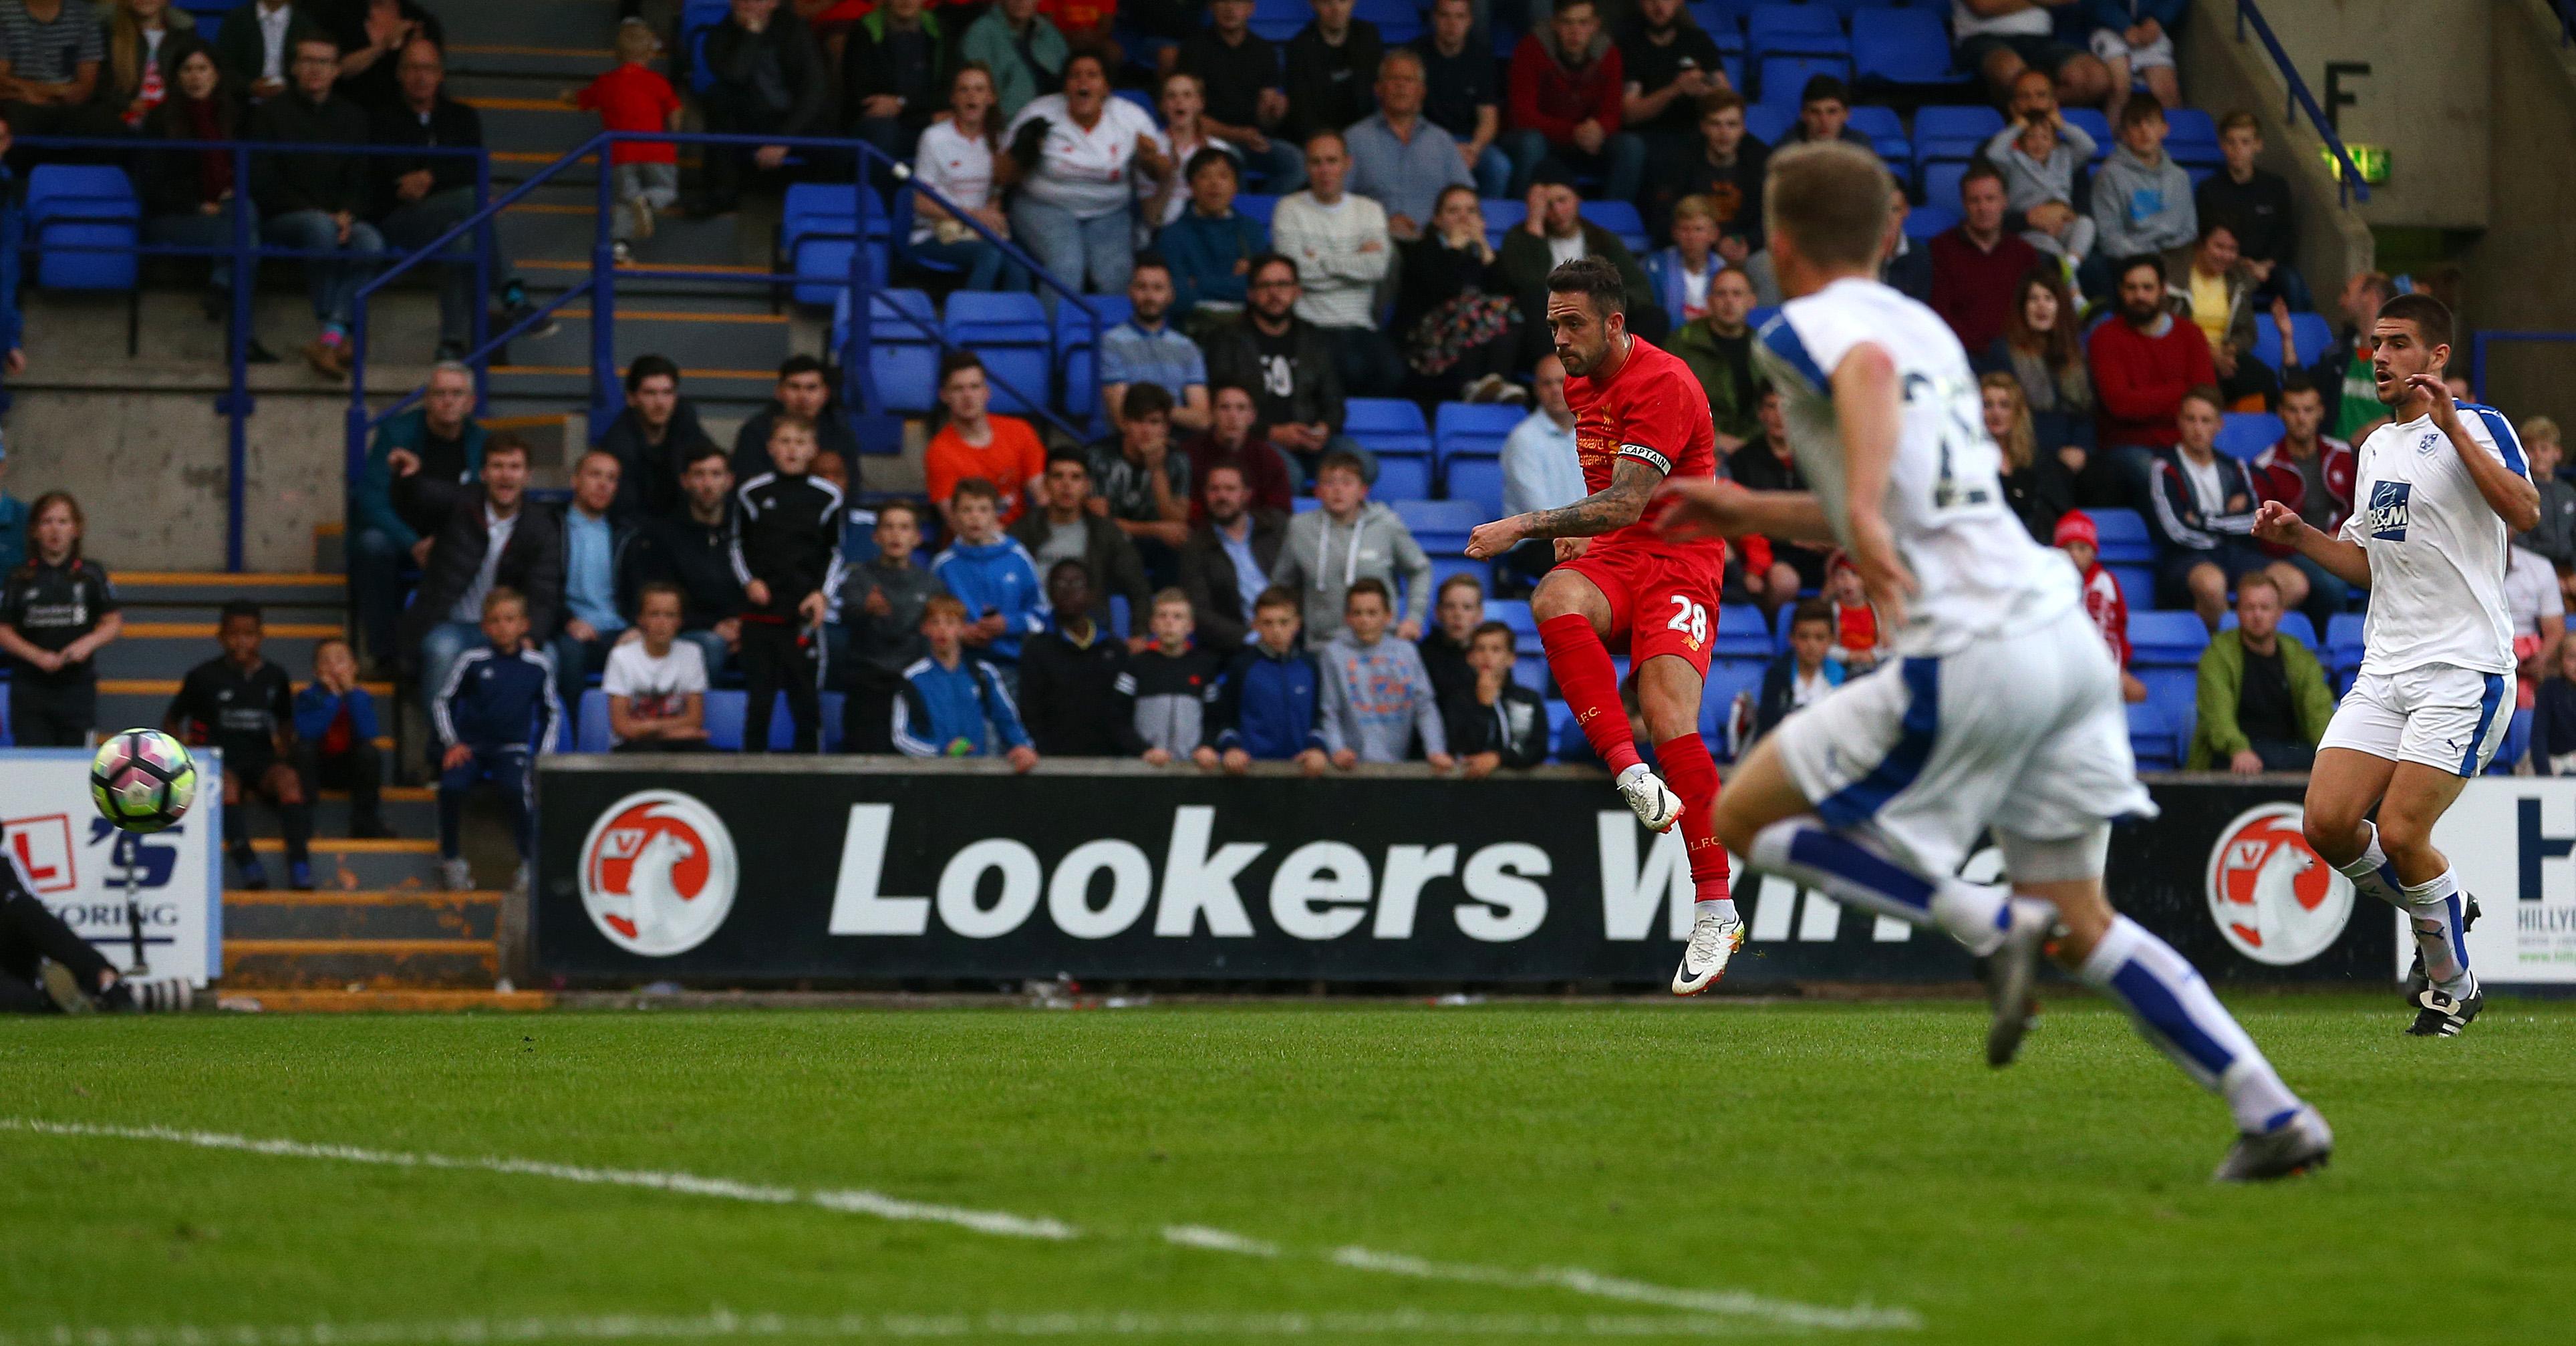 Liverpool's Danny Ings celebrates scoring on return vs Tranmere